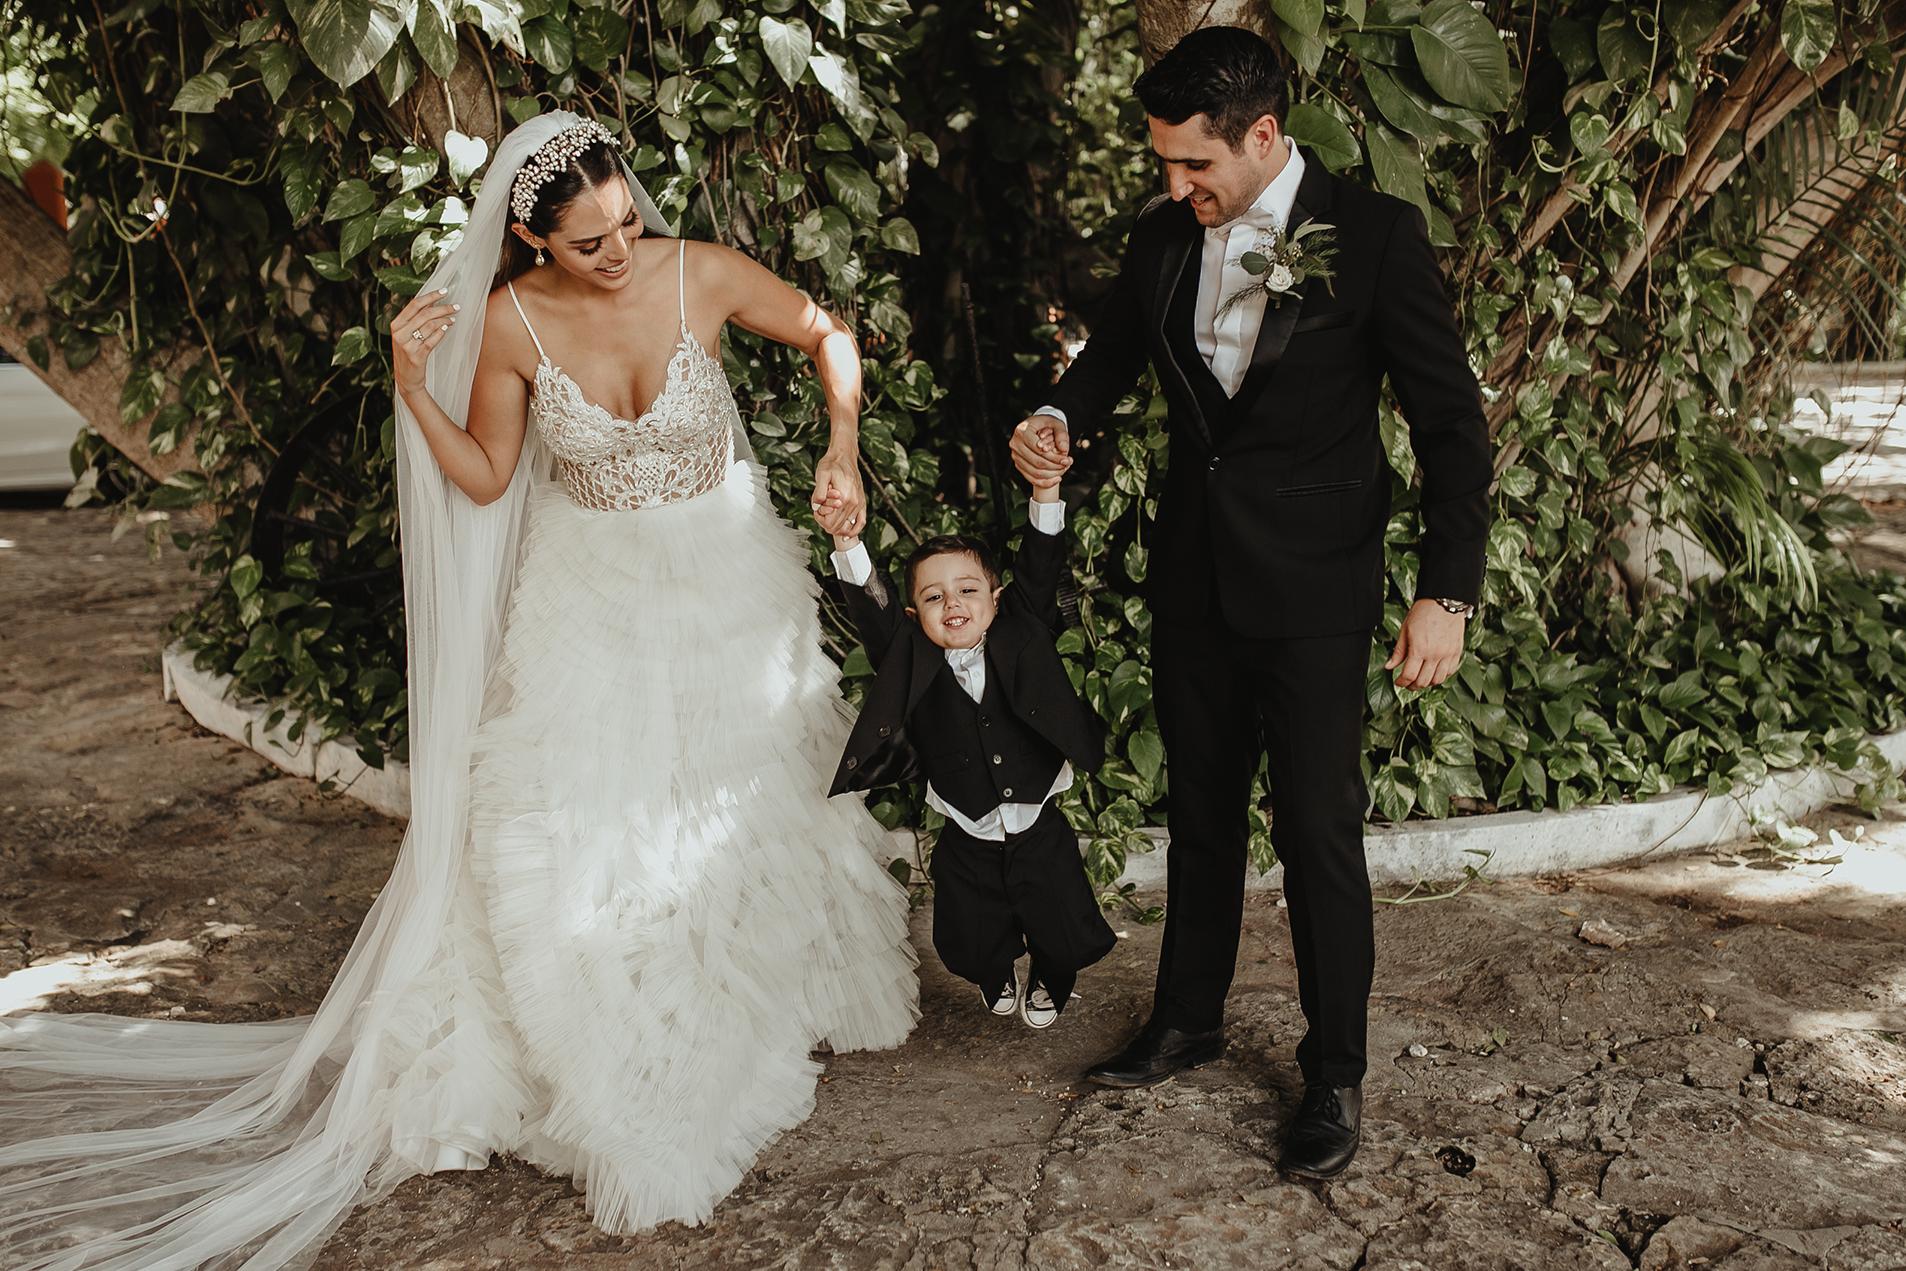 0428R&F__WeddingDestination_Weddingmerida_BodaMexico_FotografoDeBodas_FabrizioSimoneenFotografo.jpg